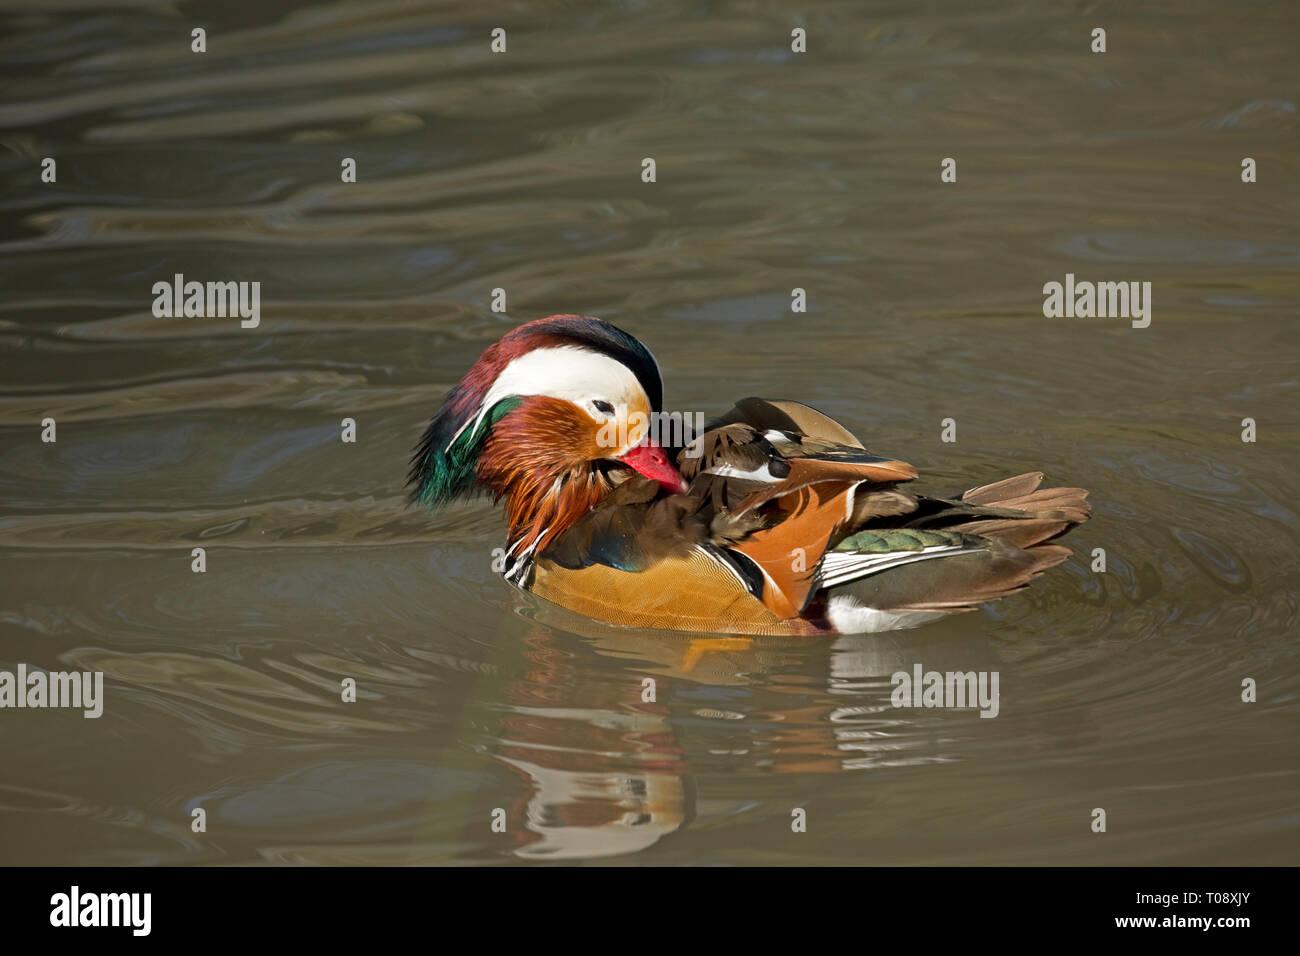 Single male Mandarin duck, Aix galericulata, swimming, Wildfowl and Wetland Trust, Slimbridge, UK Stock Photo